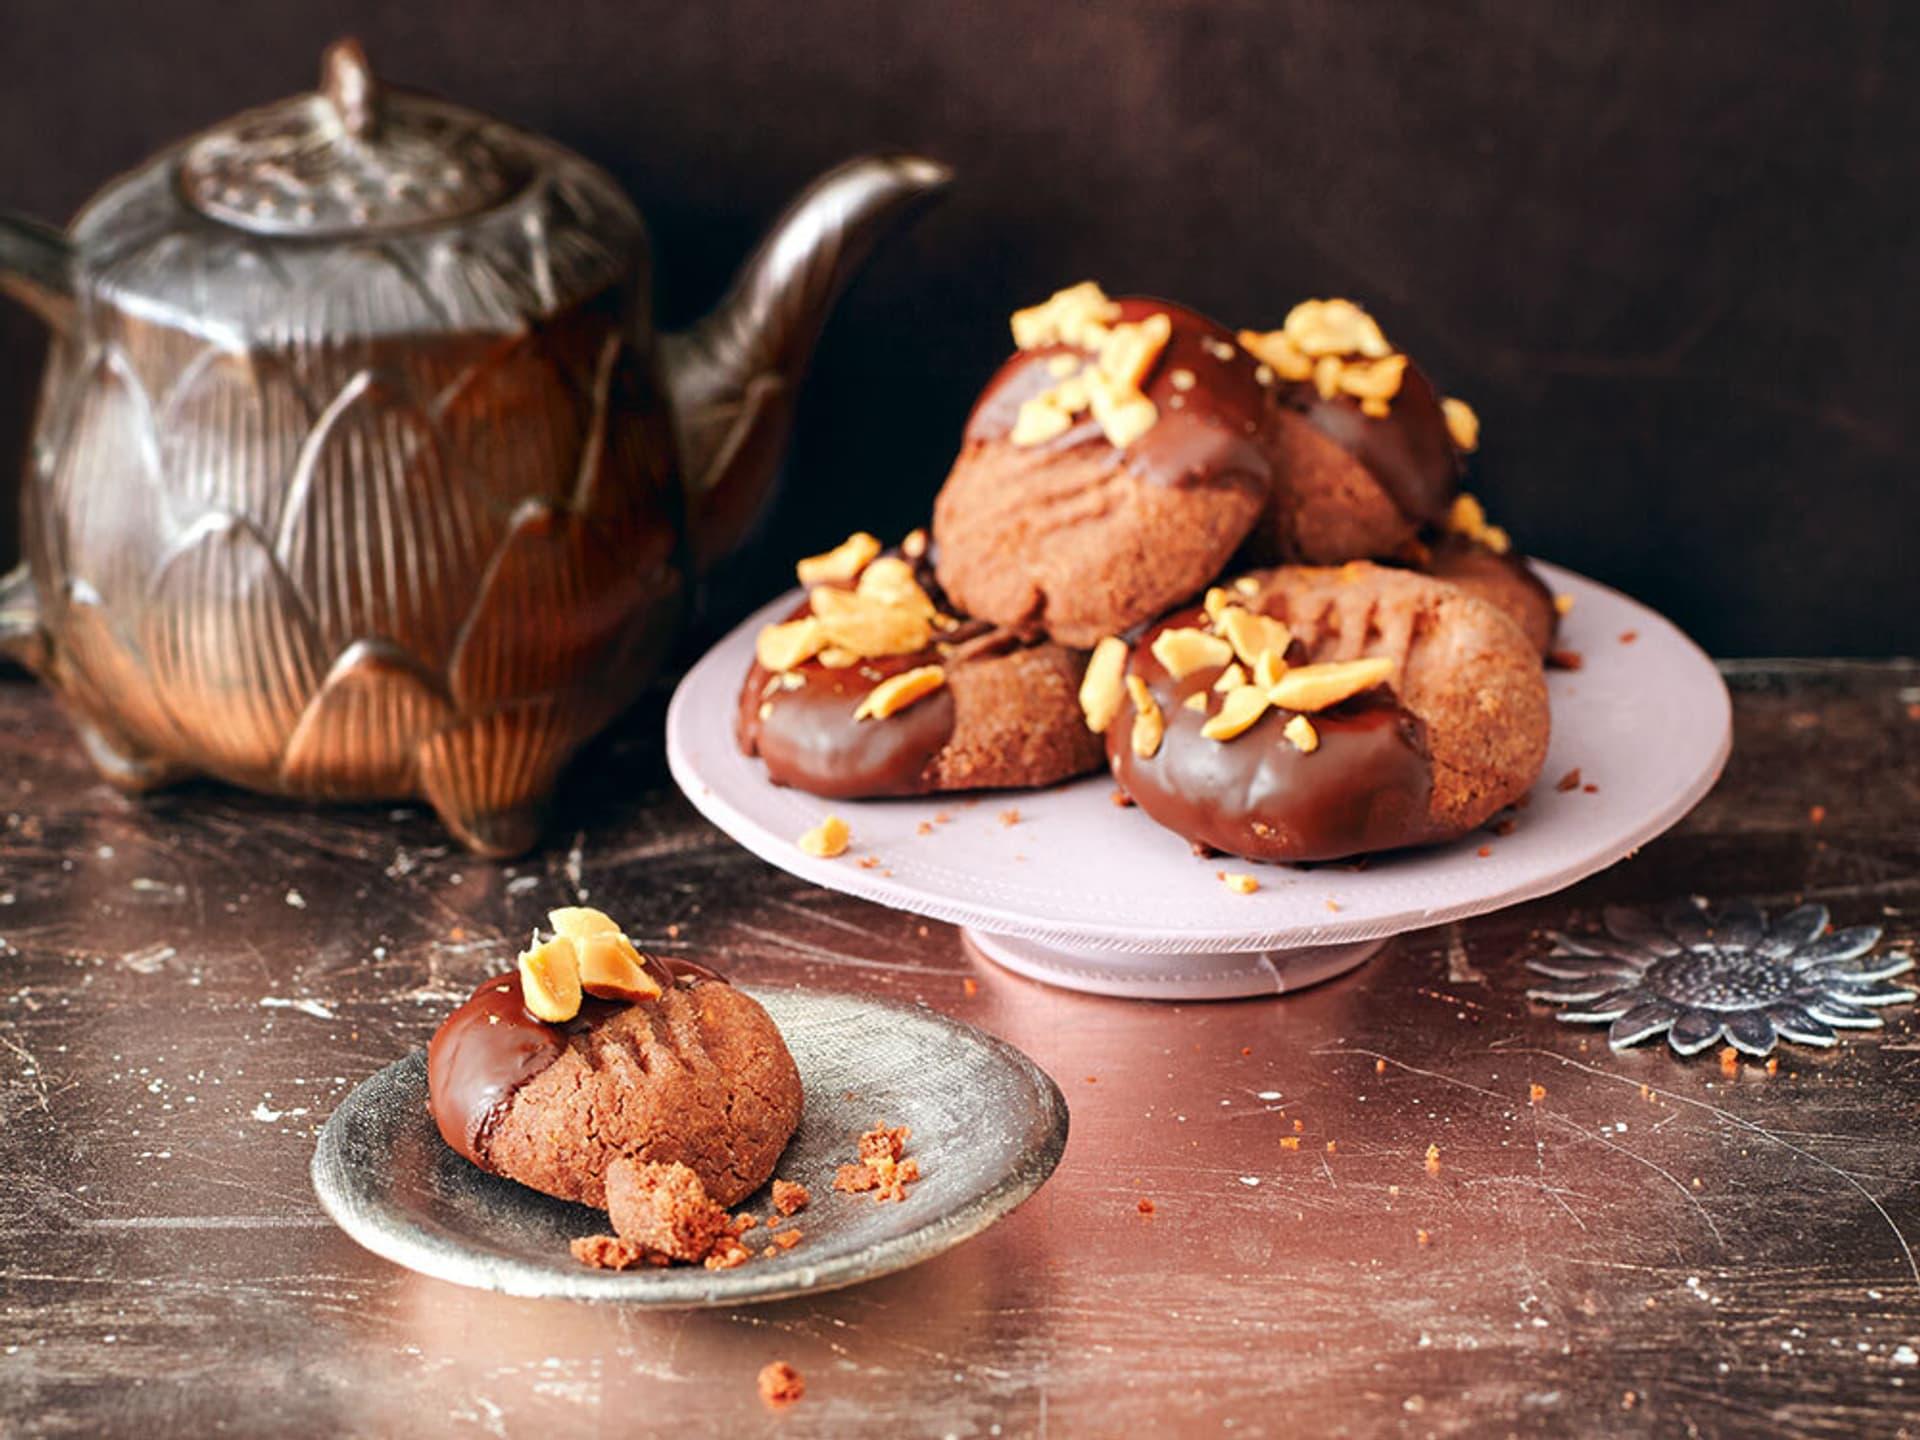 Kakao-Erdnussmürbchen